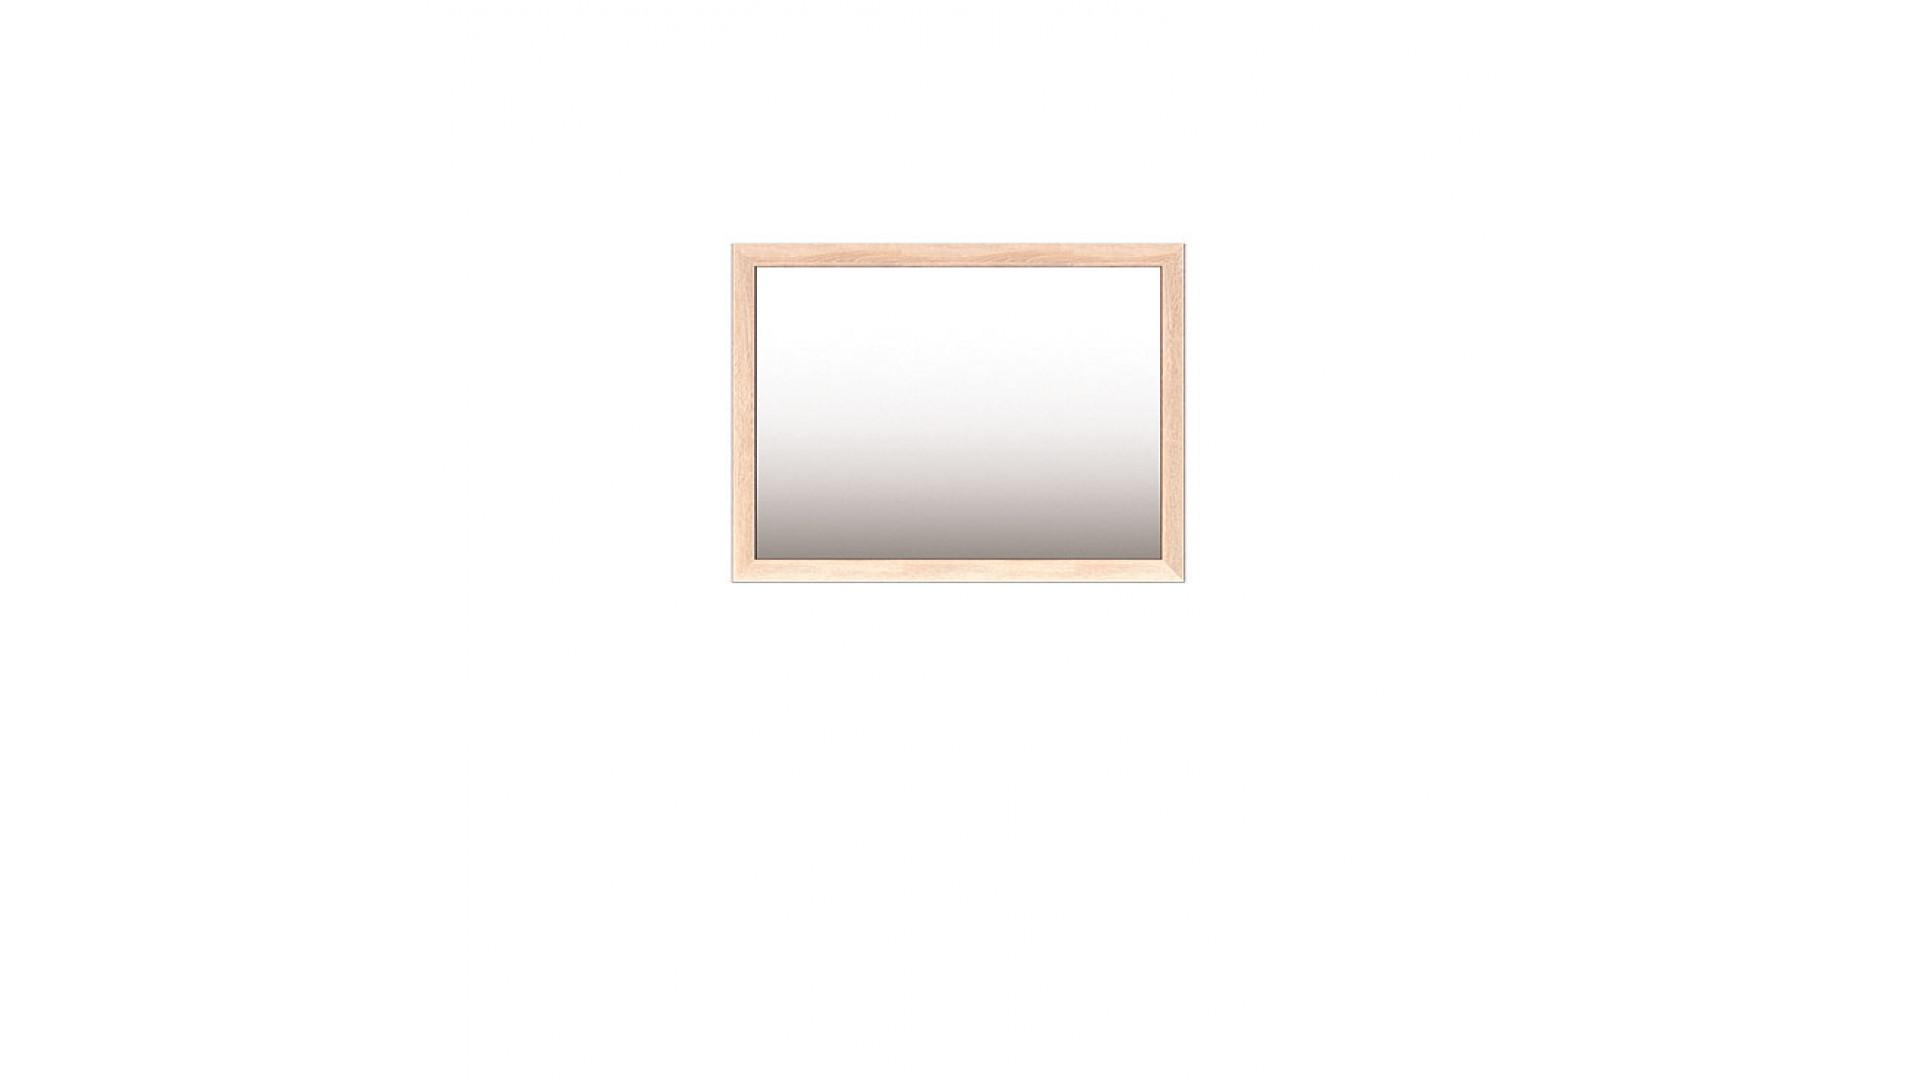 зеркало над комодом Кураж Вега Прованс